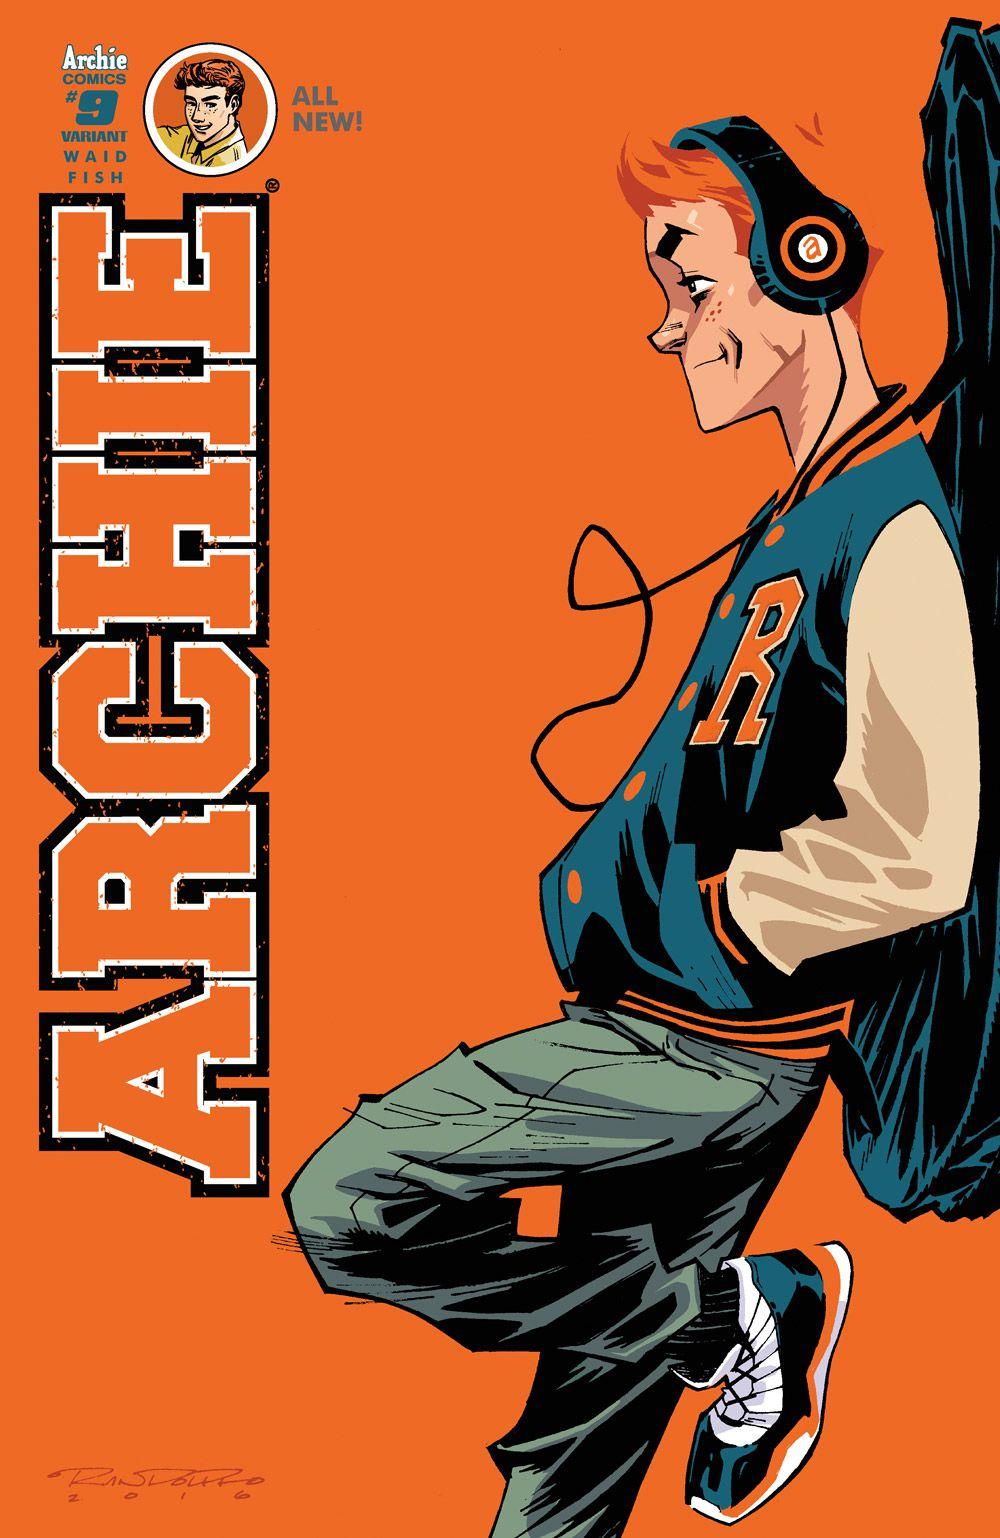 Archie #9 Variant - Khary Randolph